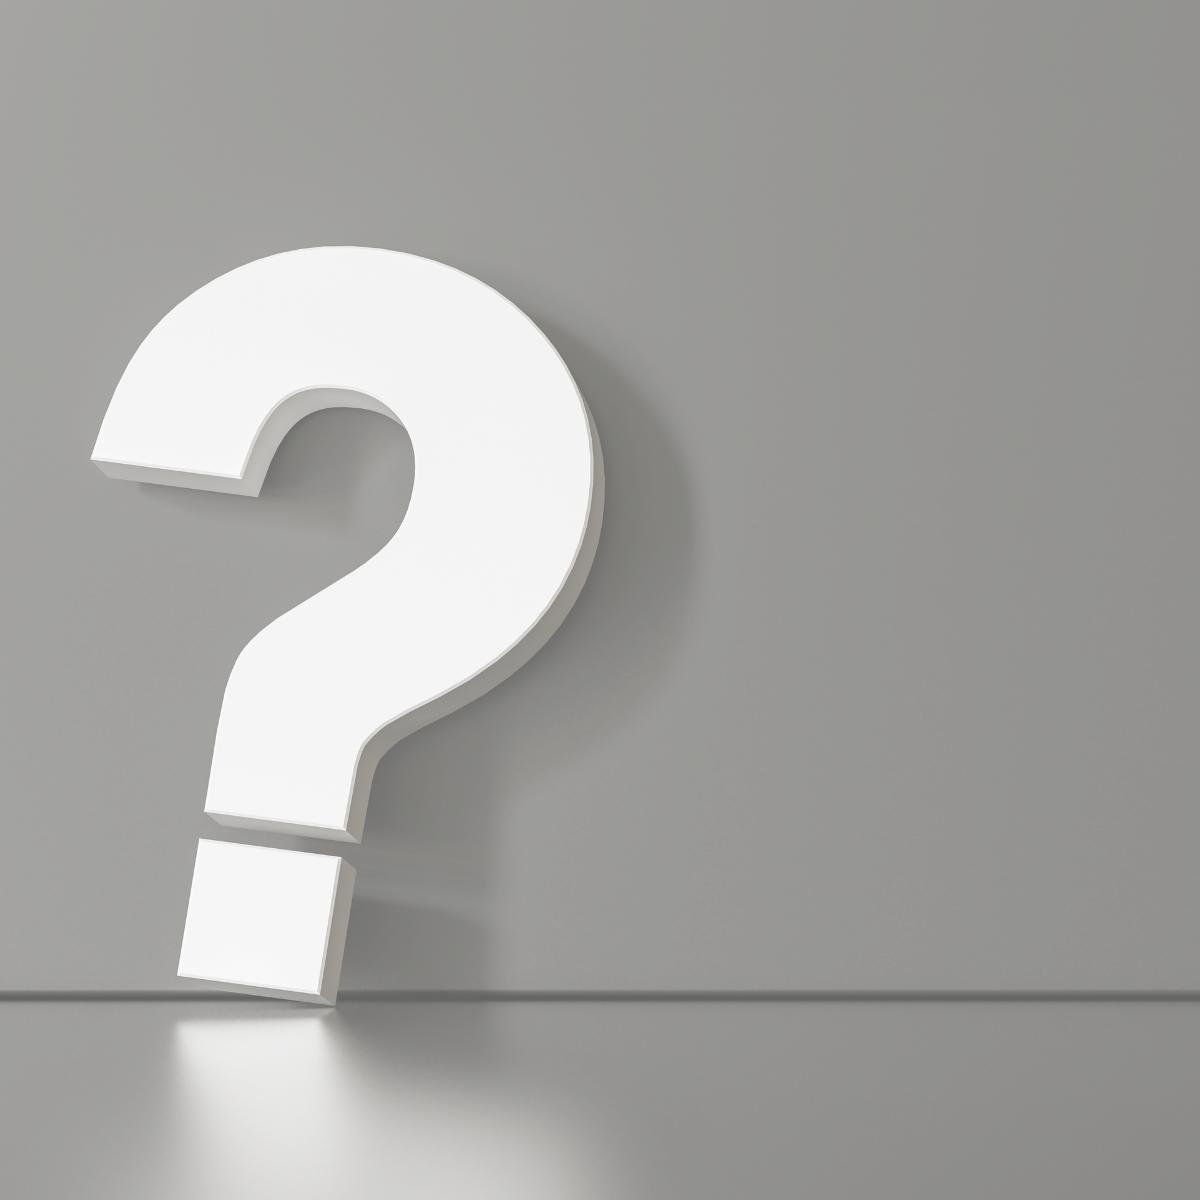 1200x1200 Size FAQ Image Card